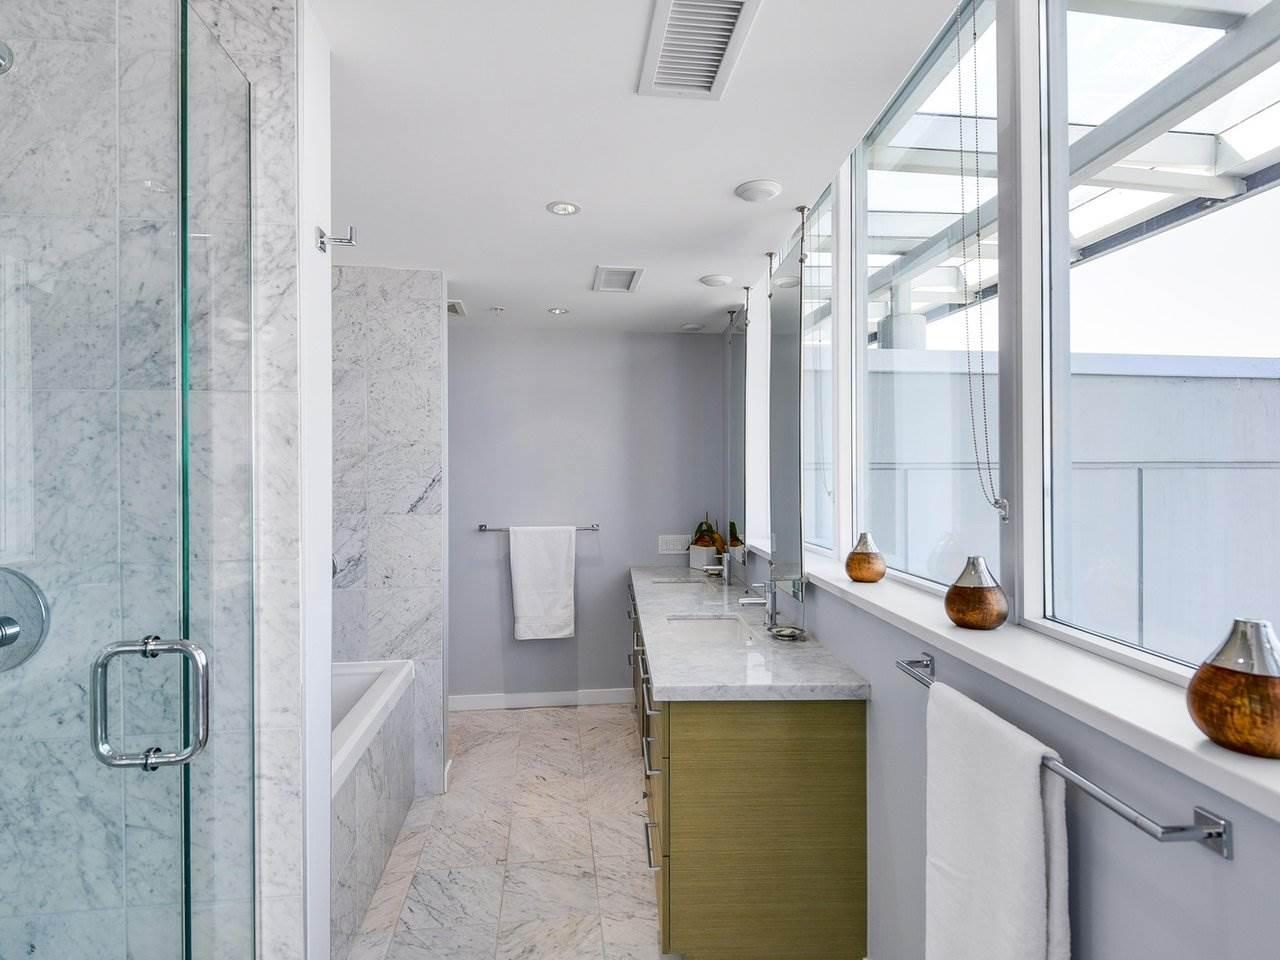 Condo Apartment at PH3 833 SEYMOUR STREET, Unit PH3, Vancouver West, British Columbia. Image 14